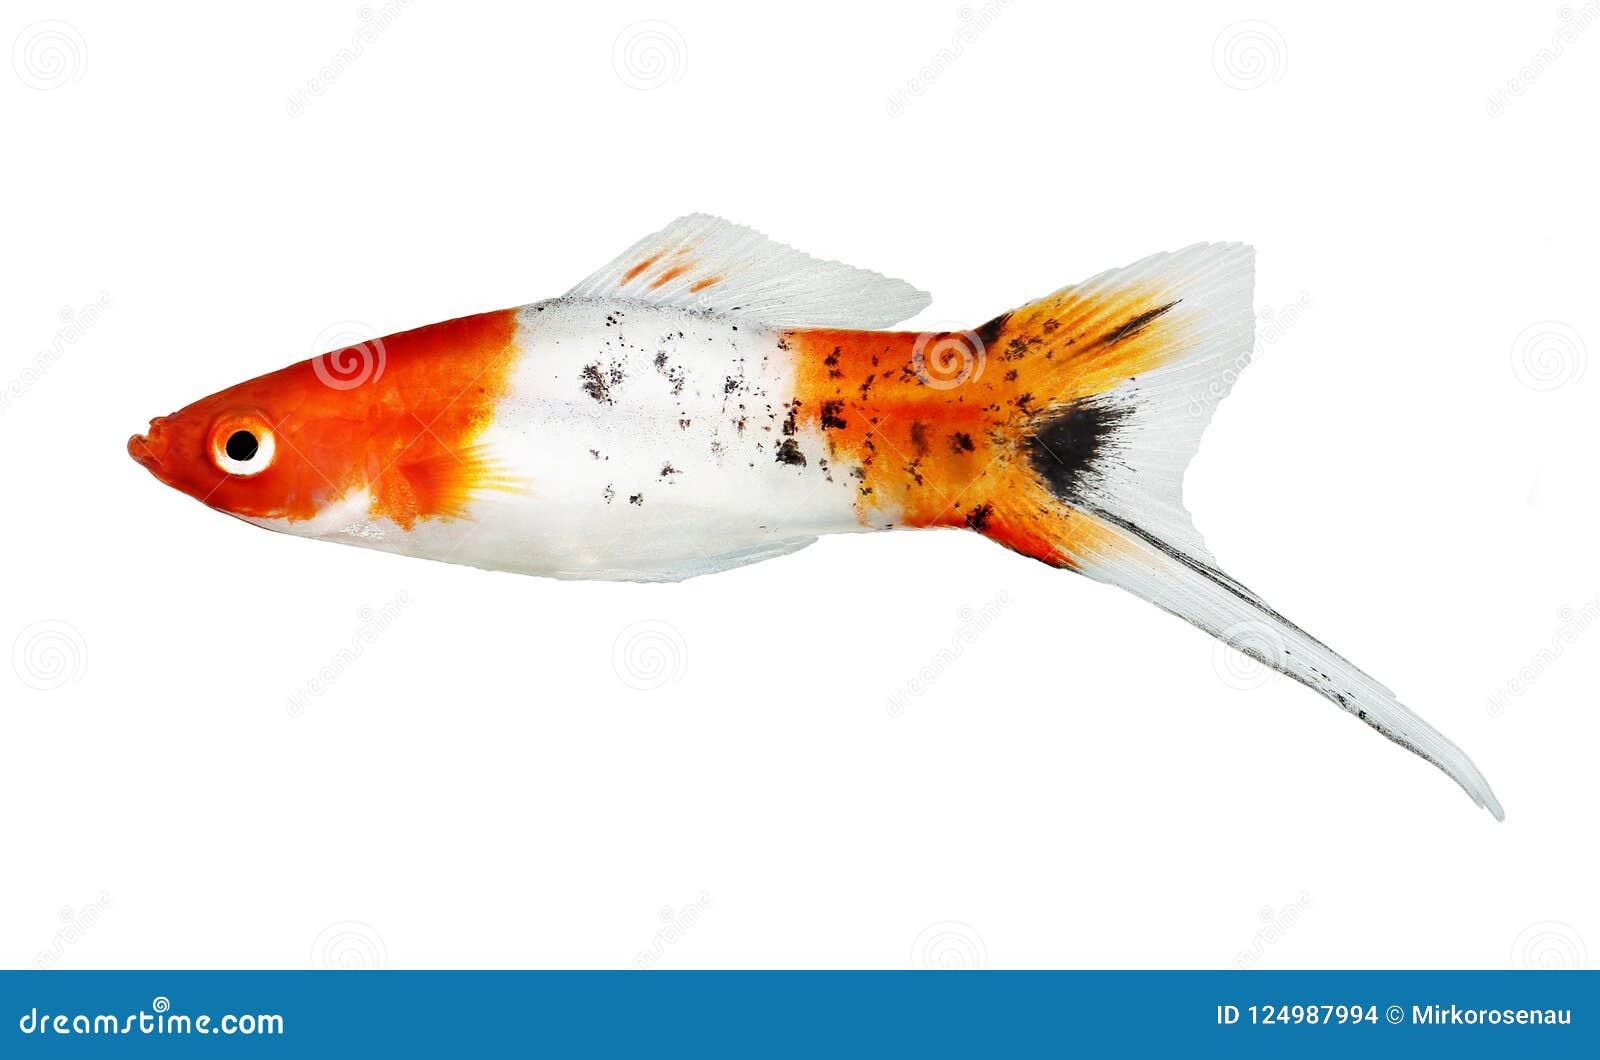 Koi Swordtail Xiphophorus Helleri Αρσενικό ψάρια ενυδρείου που απομονώνονται σε λευκό